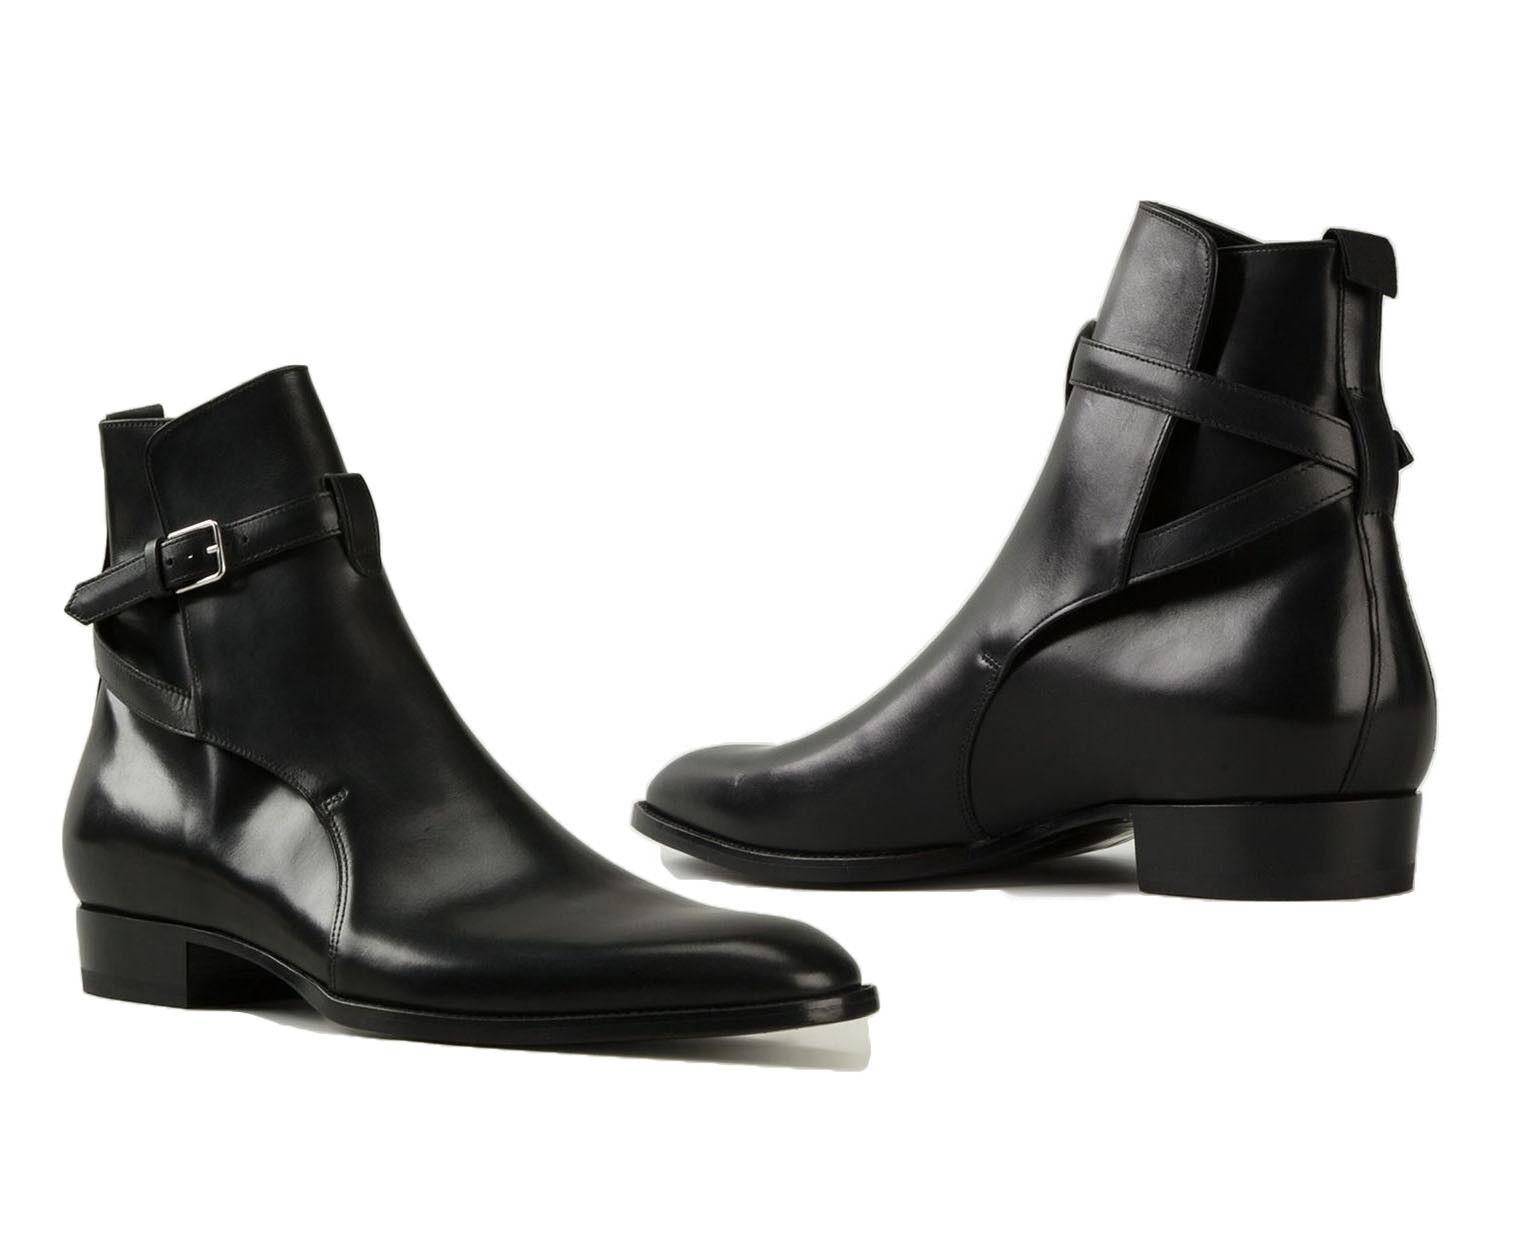 Handmade Jodhpurs Ankle Boot Men Black Buckle Leather Boots, Mens Dress Boots